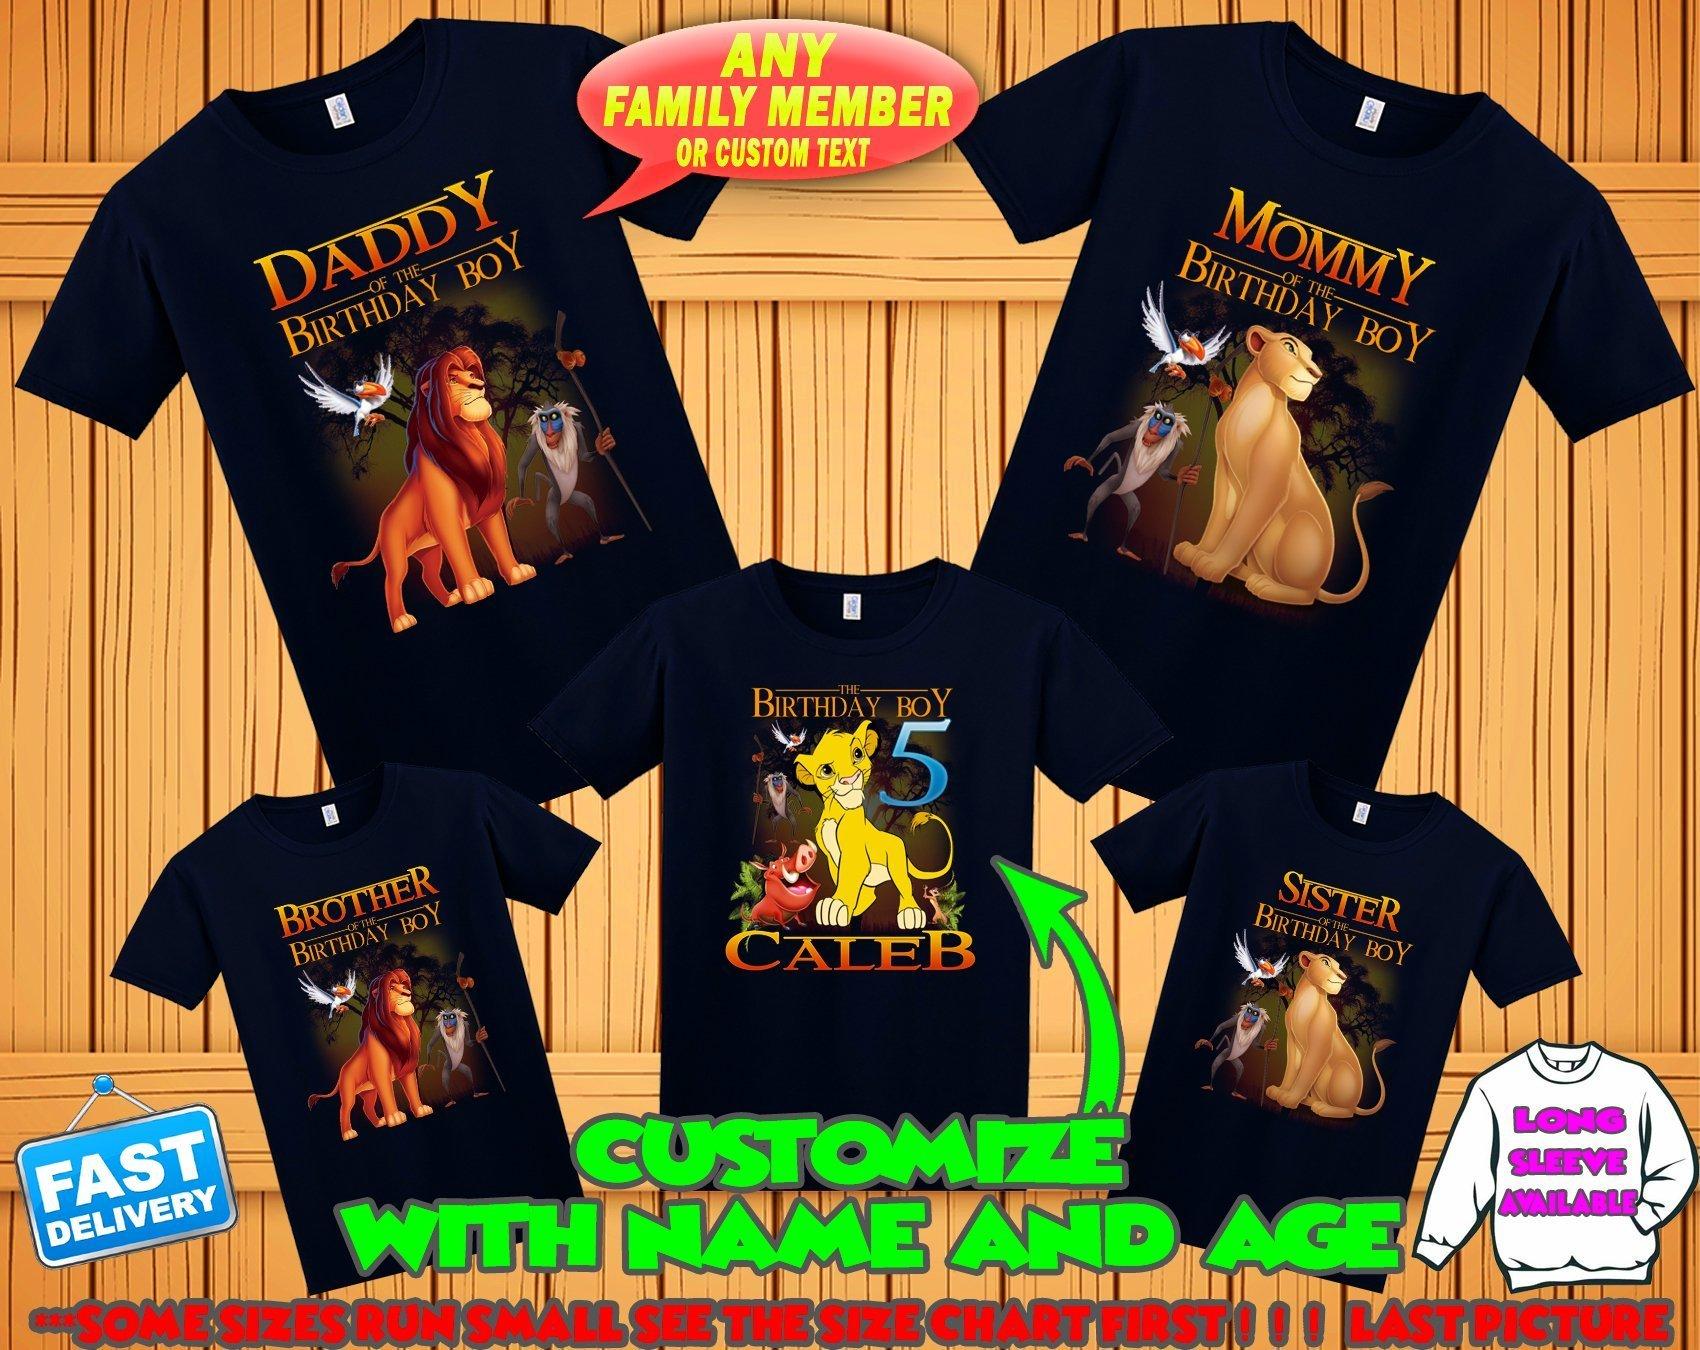 Lion King birthday shirt, Lion King family shirts, Lion King theme party shirts, Lion King matching shirts, Lion King tshirt, hakuna matata by Birthday T-shirts